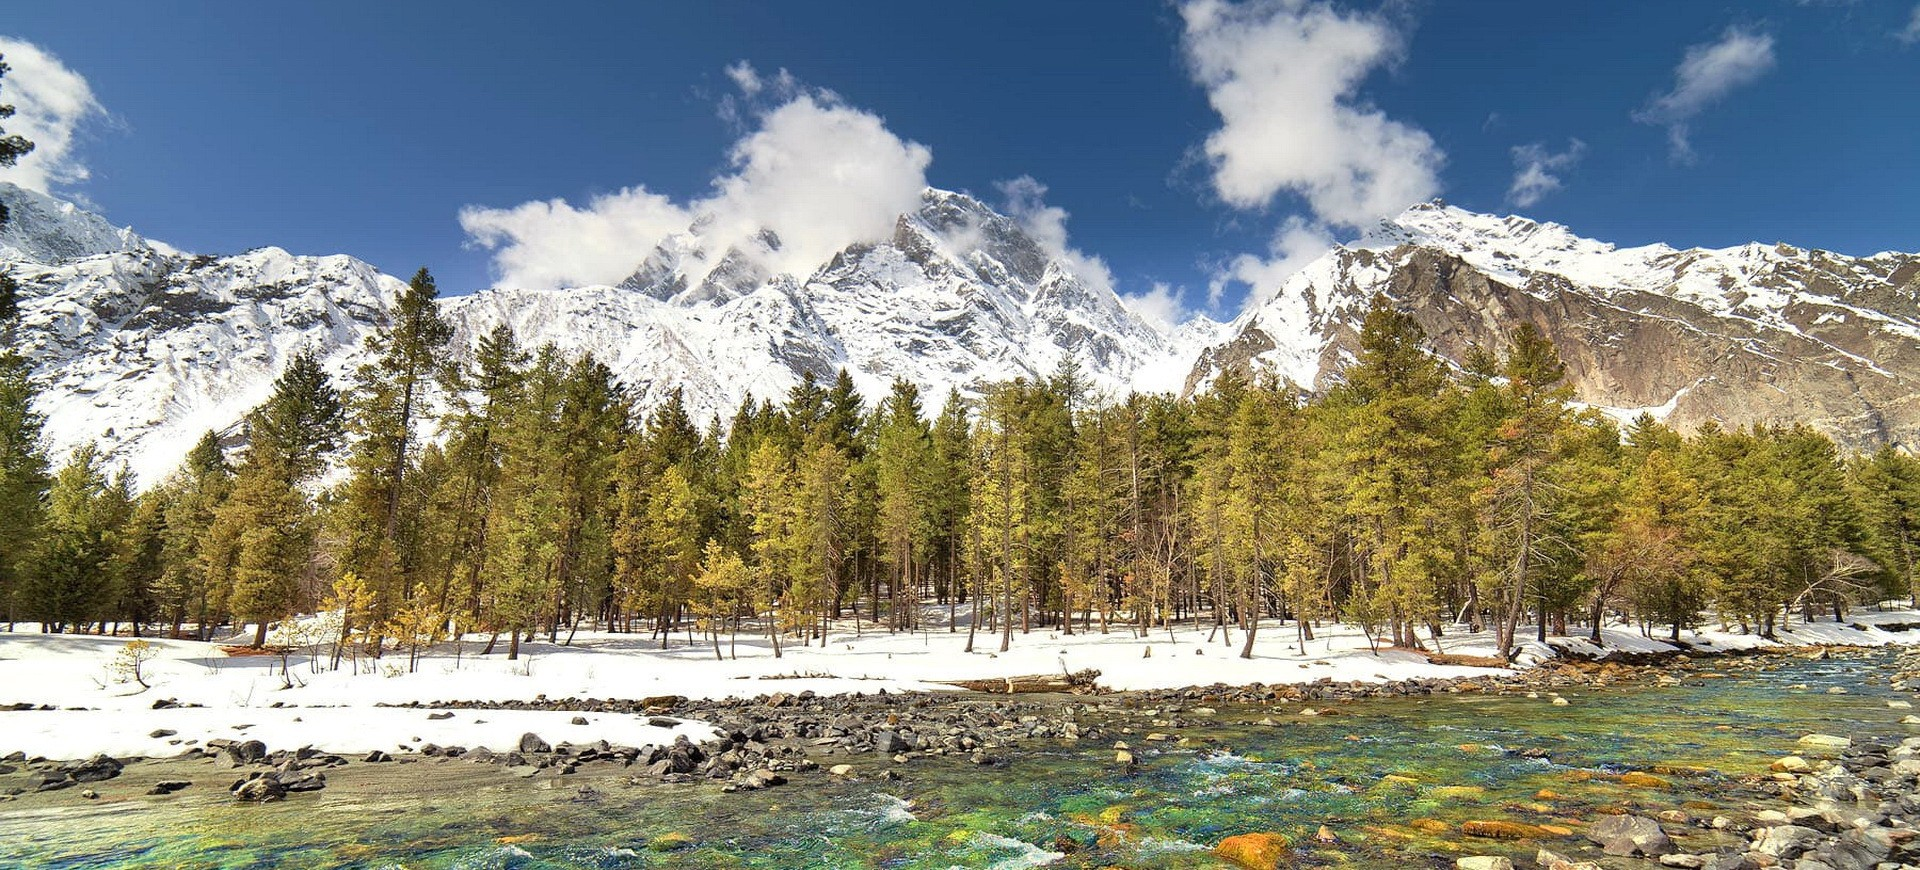 Vallée de Naltar à Gilgit Baltistan